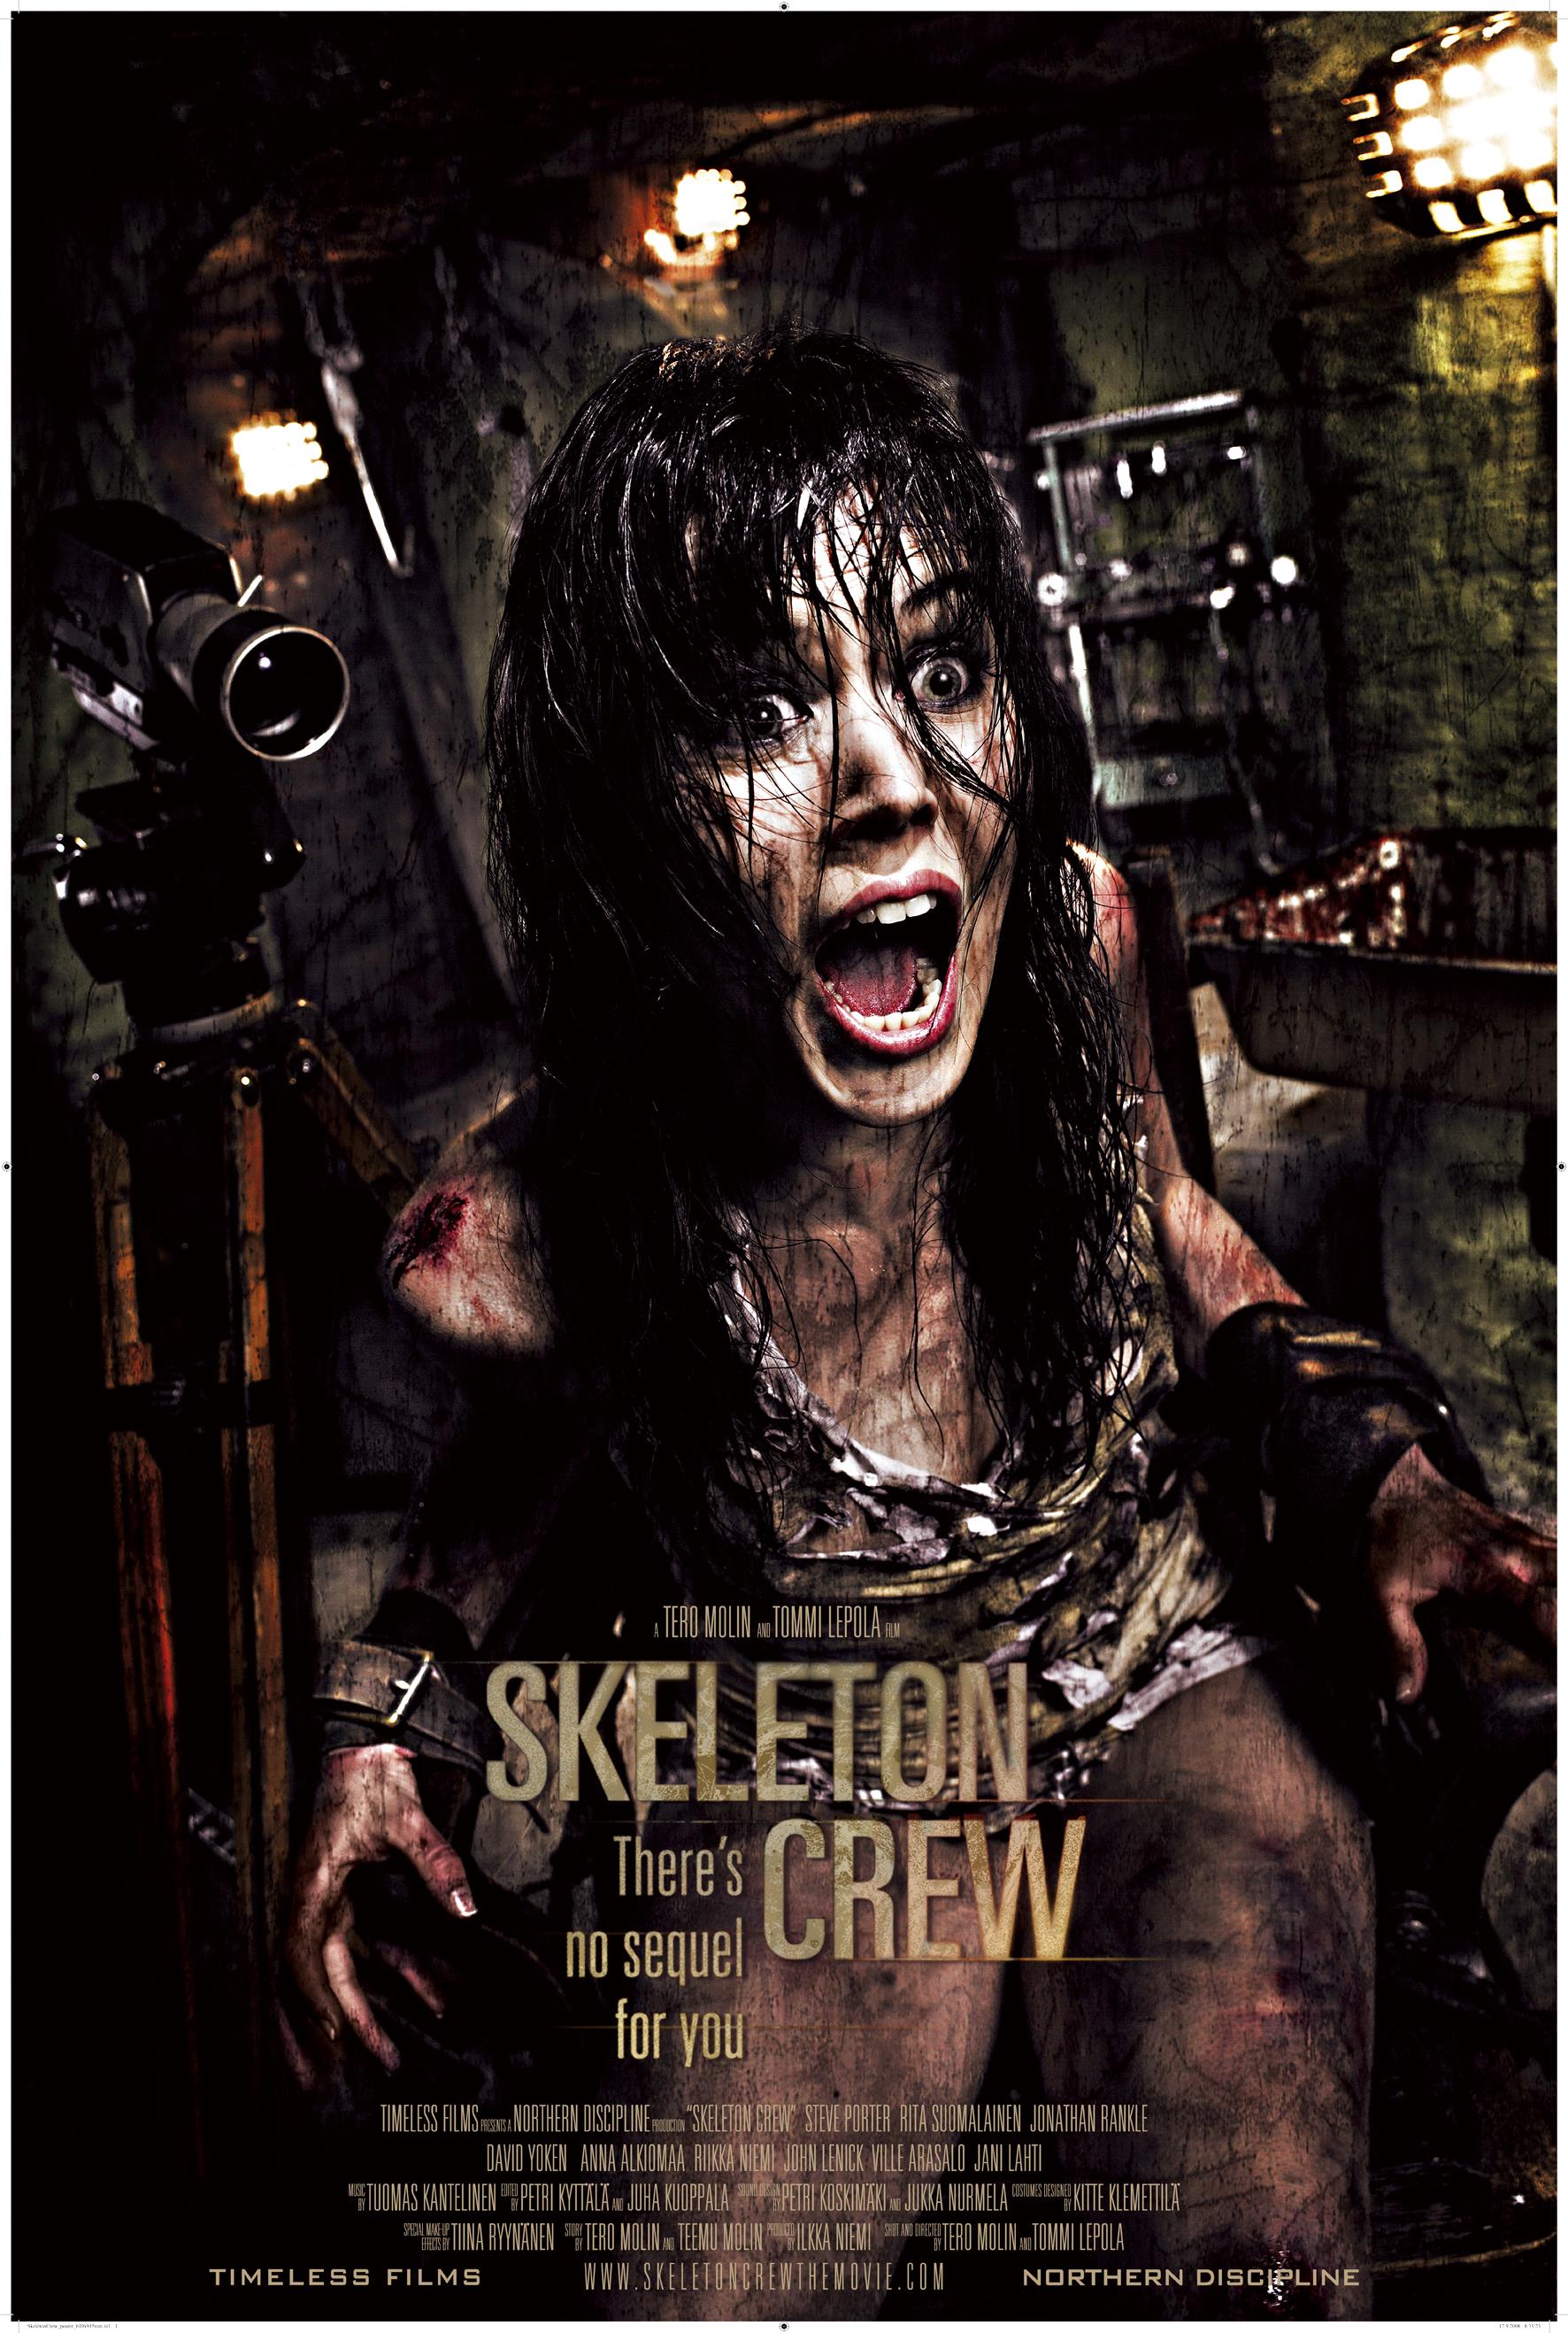 SkeletonCrew_poster